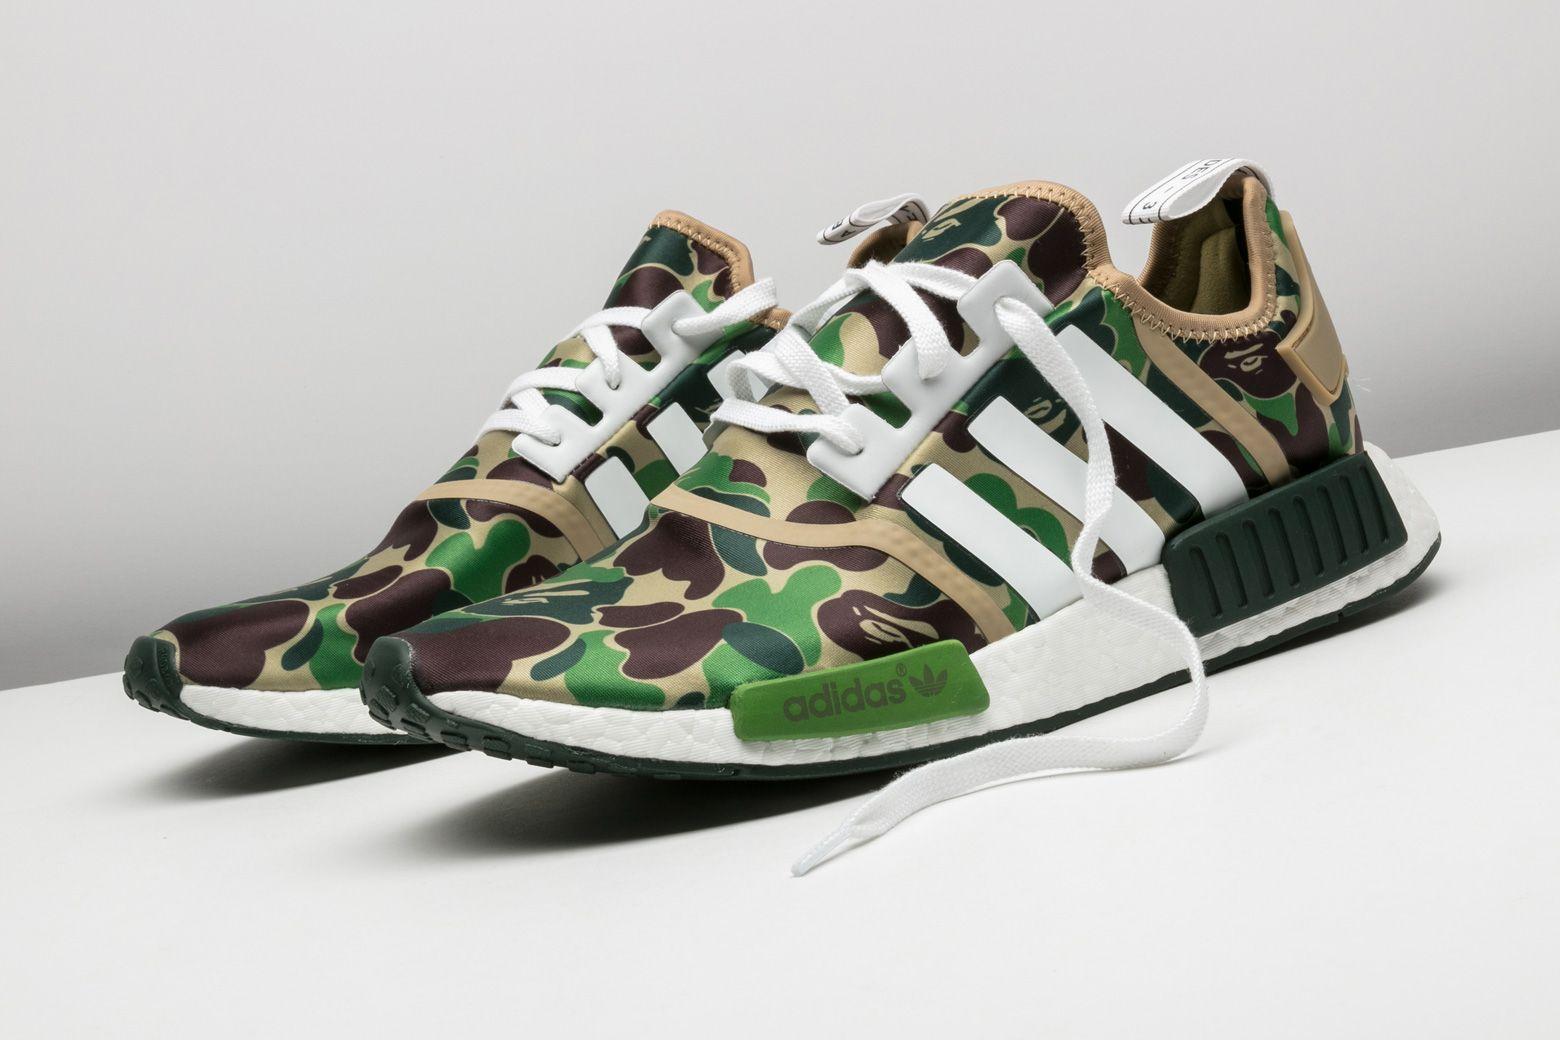 finest selection ea9a0 8213b Adidas NMD_R1 Bape